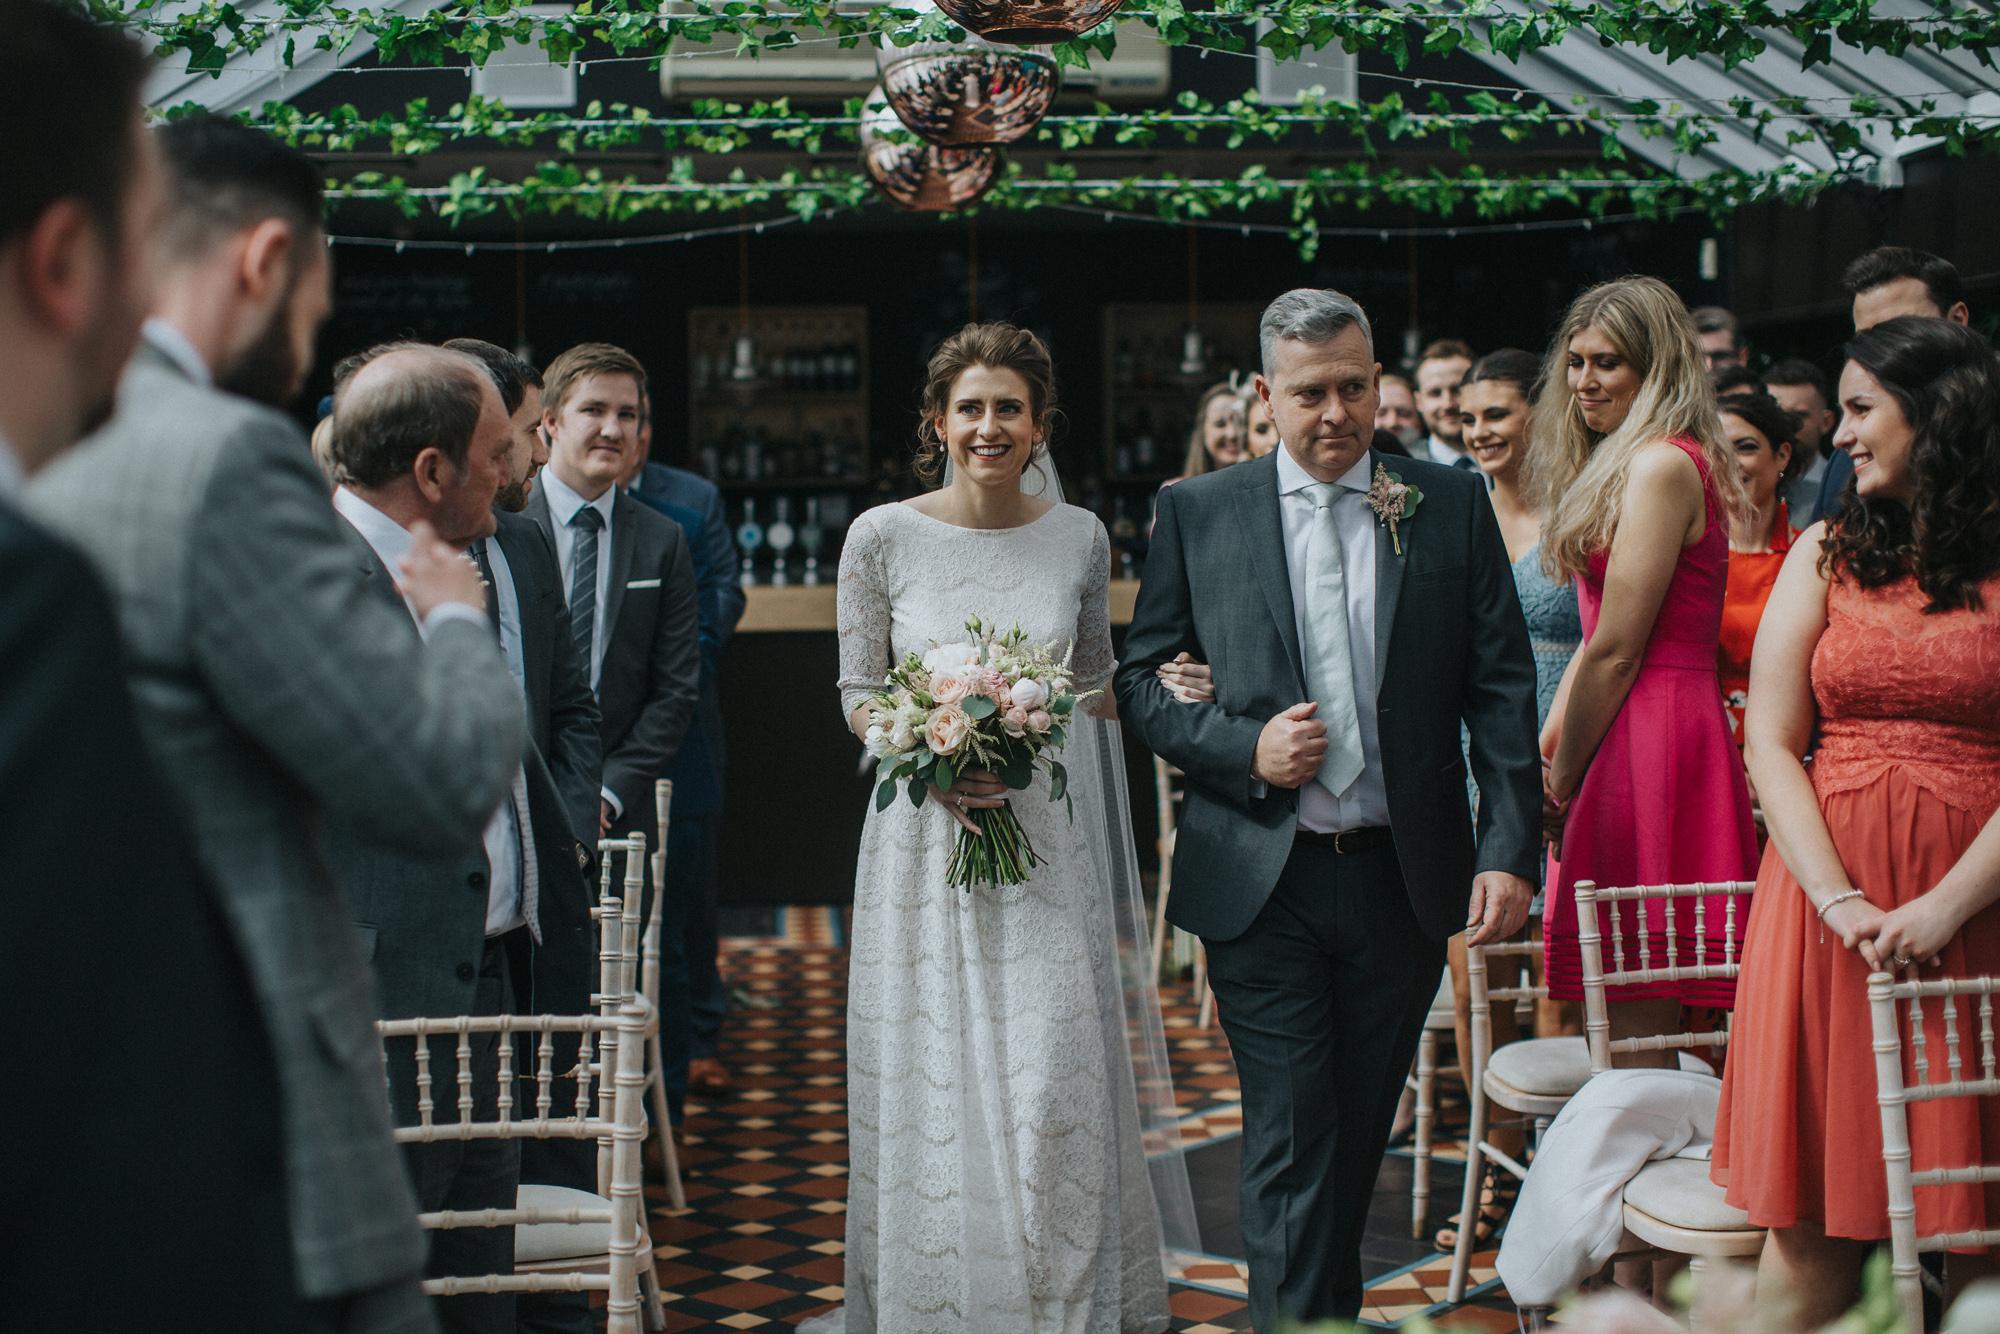 Kate-Beaumont-Lace-Flared-Dahlia-Gown-Leeds-Wedding-Bloom-Weddings-16.jpg